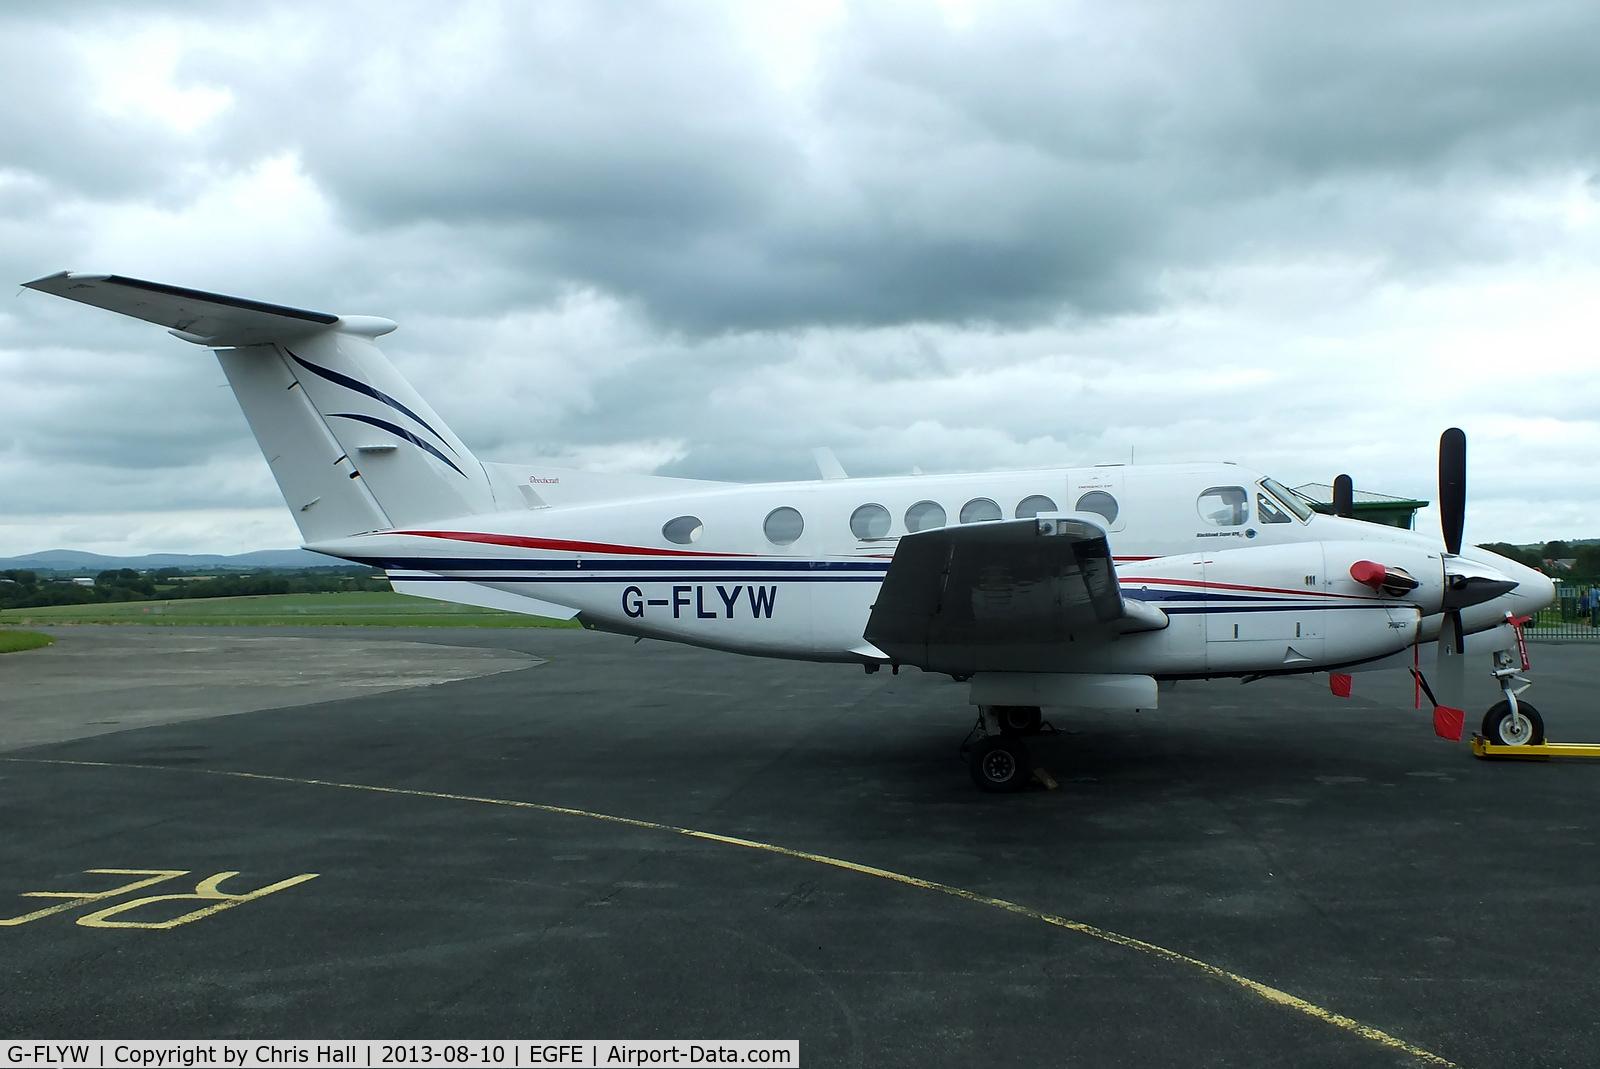 G-FLYW, 1977 Beech 200 Super King Air C/N BB-209, FlyWales